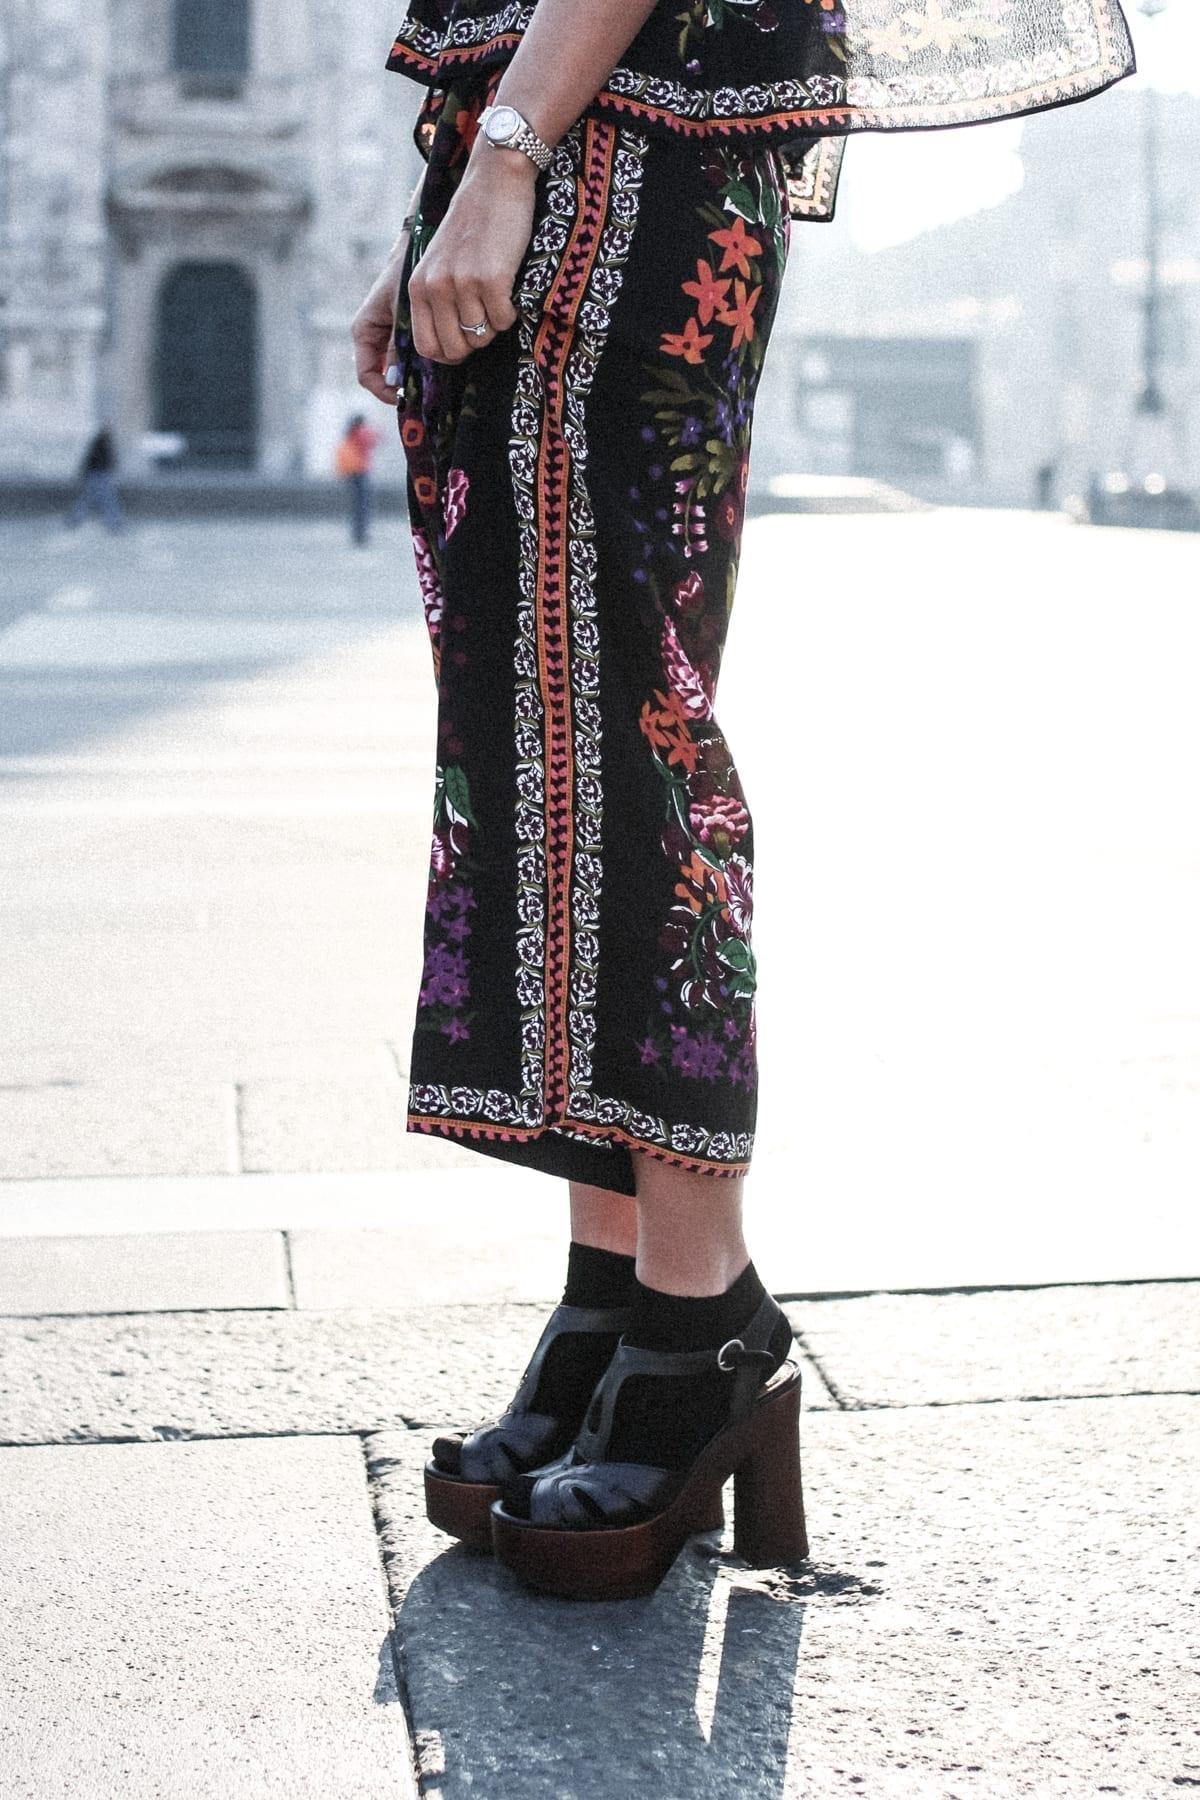 CK_1604_Constantly-K-milano-street-style-fashion-eataly-3860